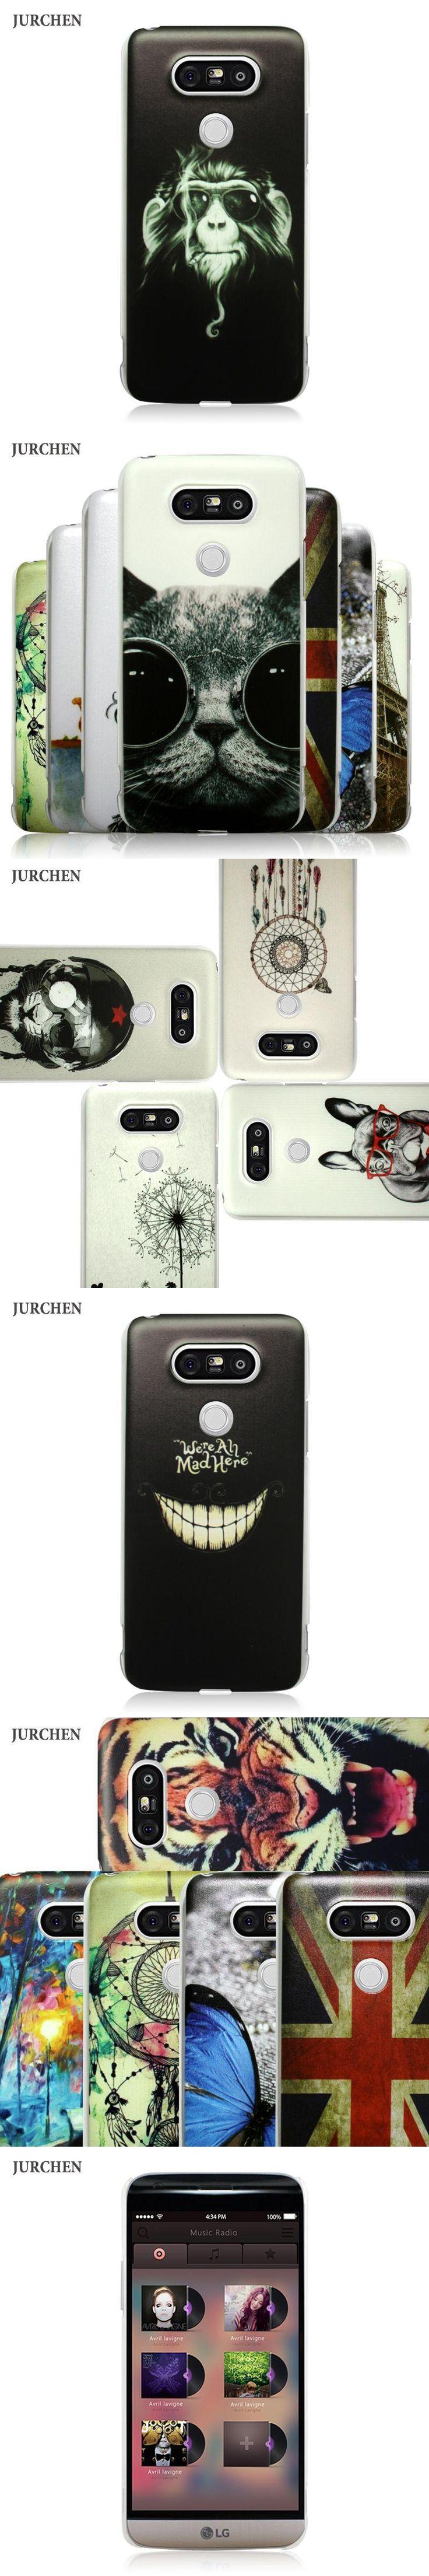 JURCHEN Case For LG G5 Case Cover For LG G5 Cover Phone Case For LG G5 SE H830 H840 H845 H850 LGG5 Case Cute Lovely Cartoon Hard